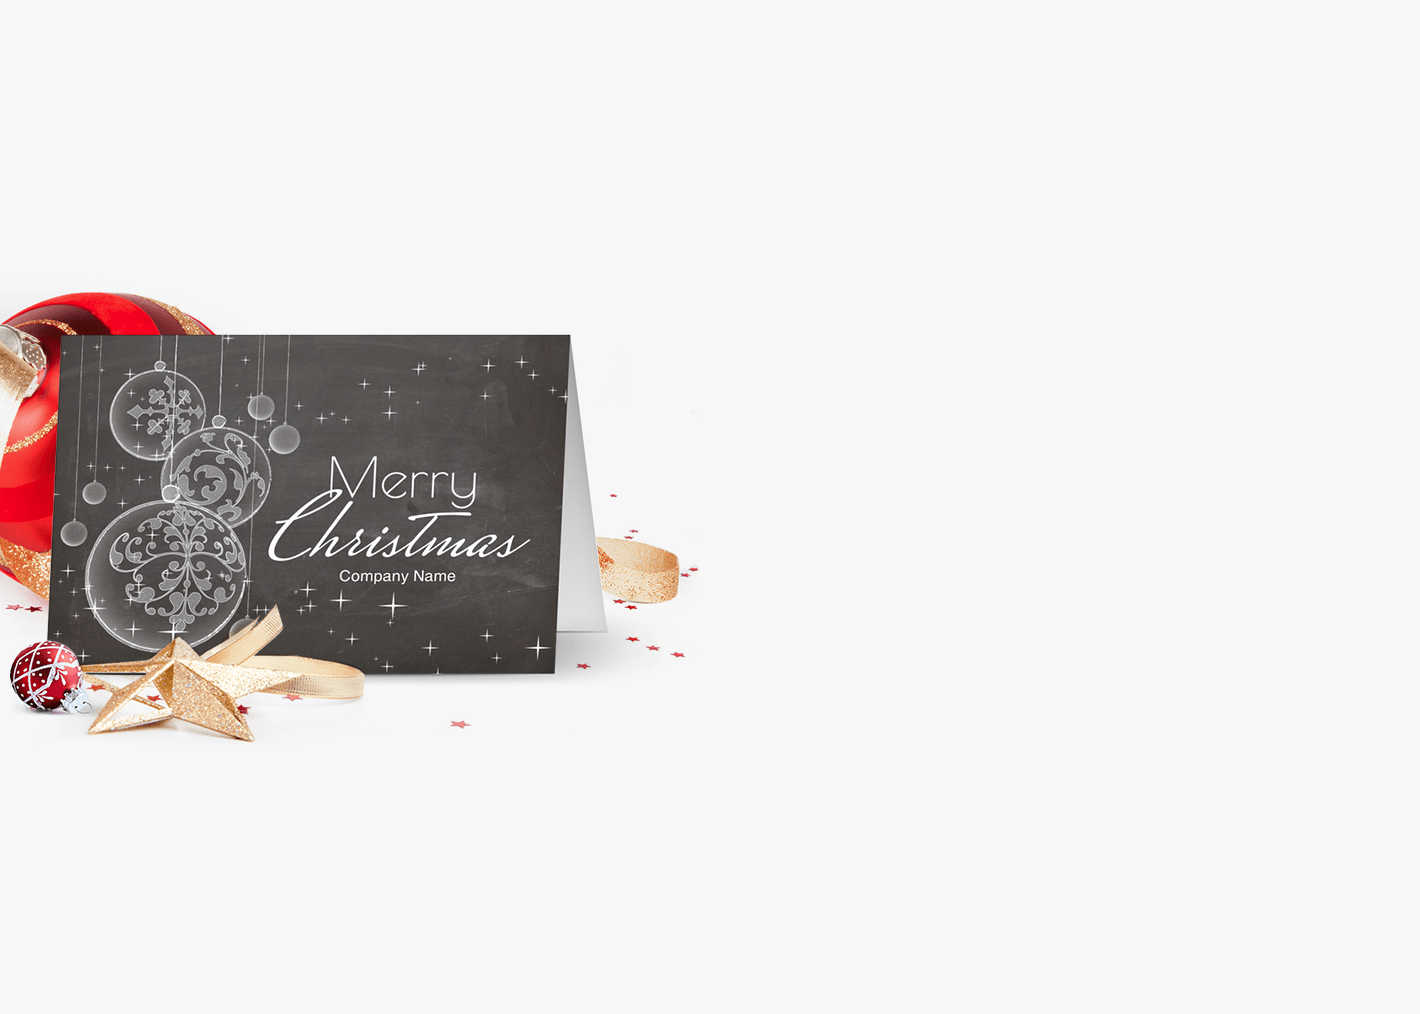 Christmas Cards 2018 Now 50 OFF Optimalprint